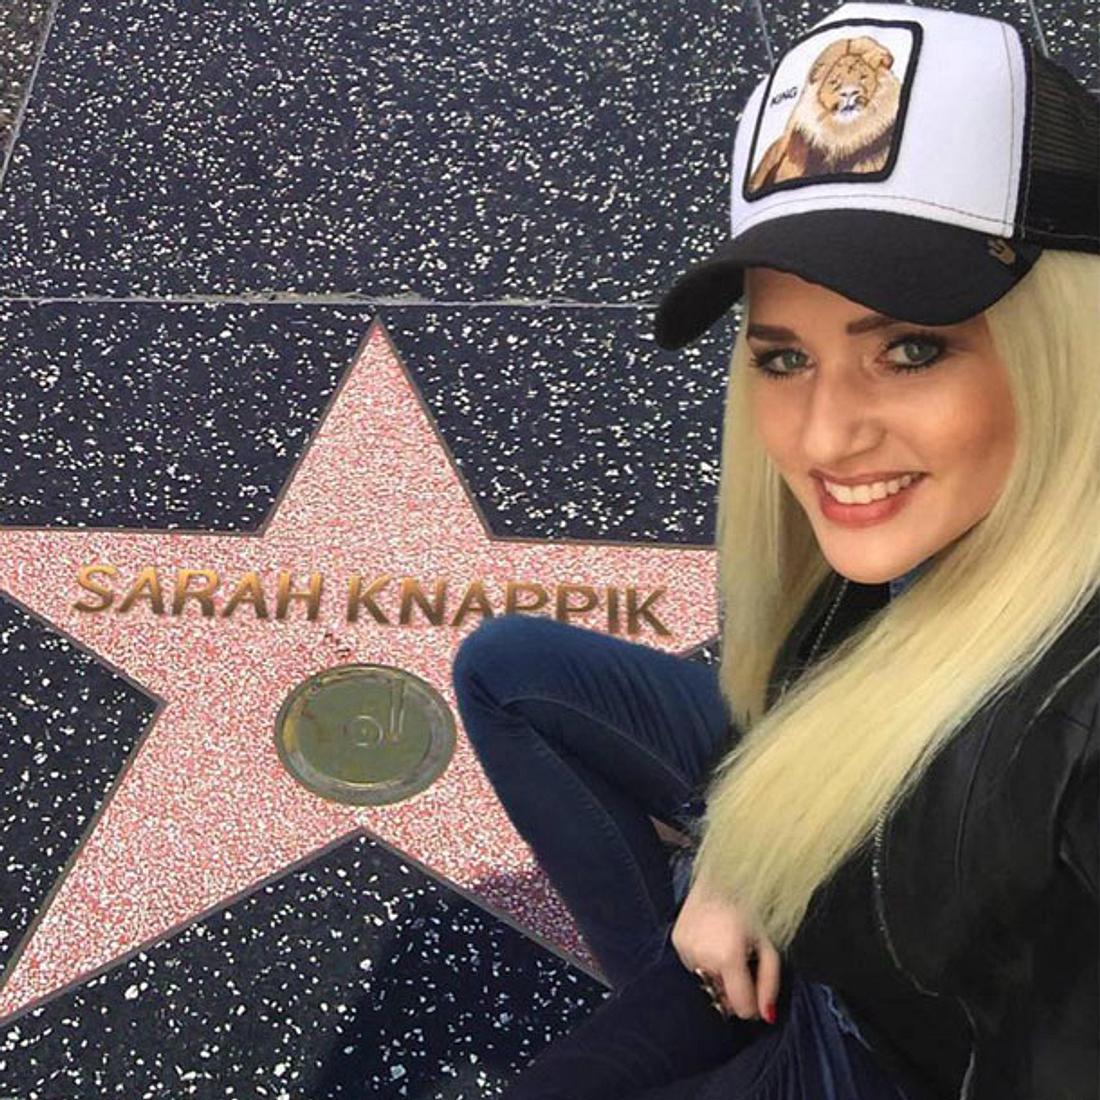 Sarah Knappik: Dschungel-Natter startet in Hollywood durch